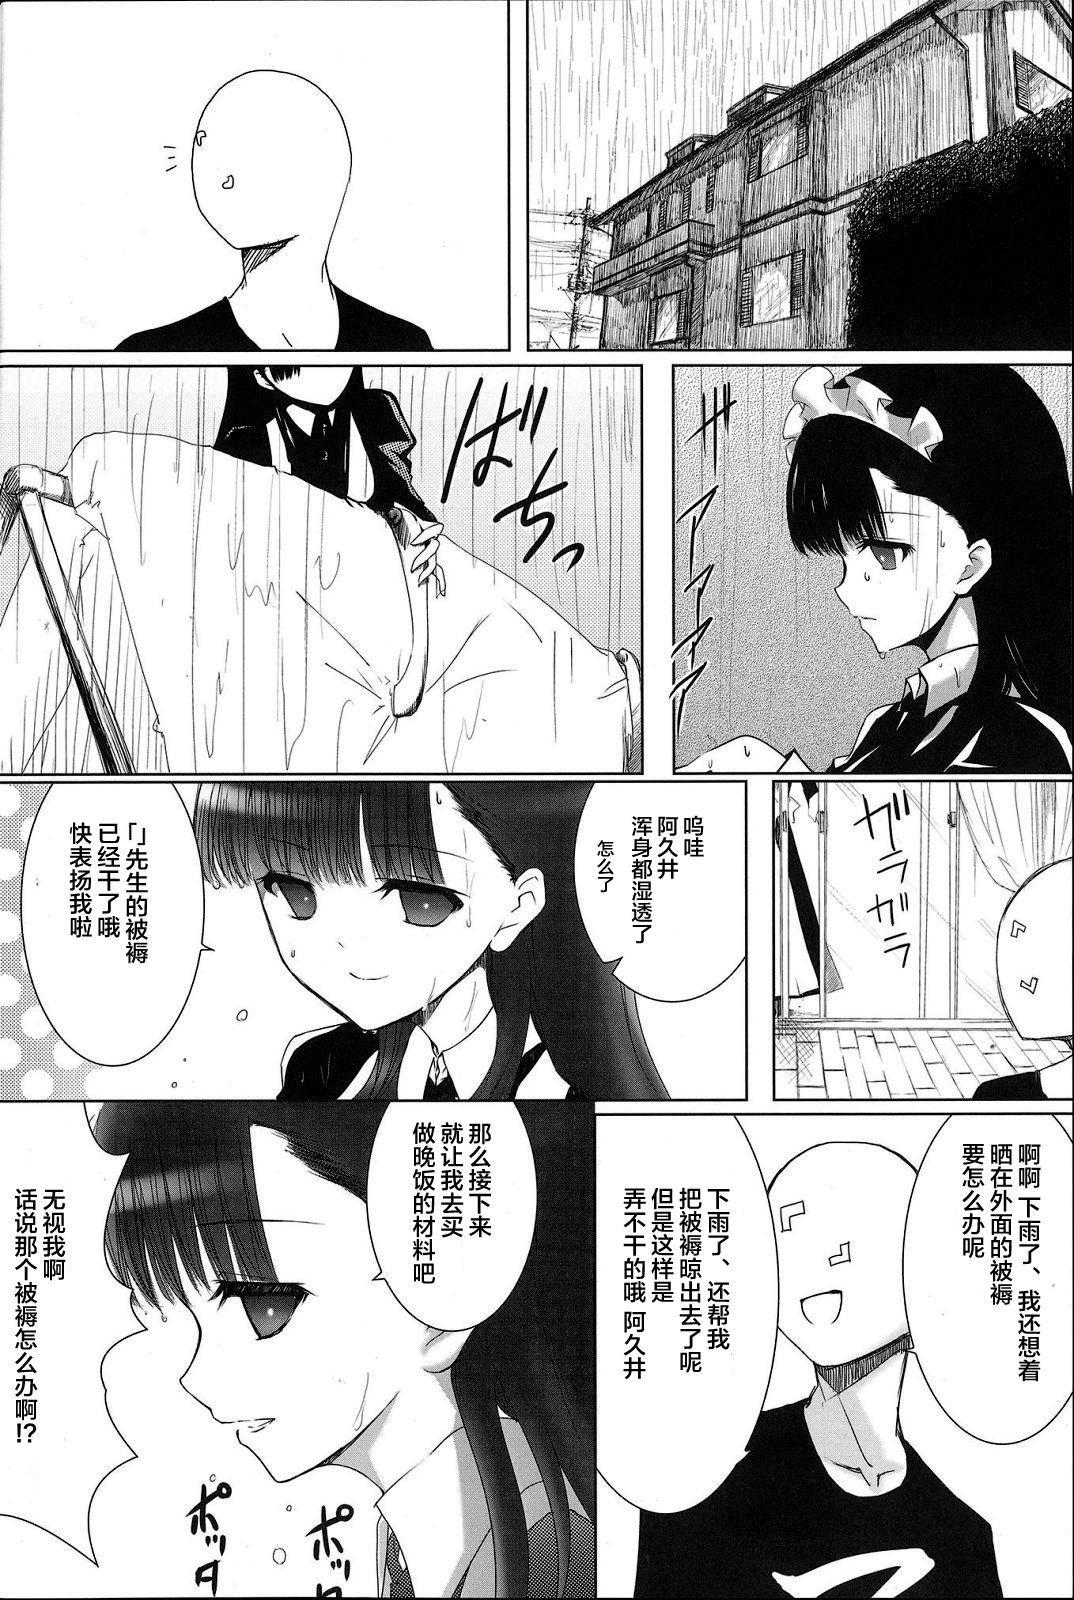 [Heikoushihenkei (Kawanakajima)] Akui-san ga Kaze hi-ta 1 | 阿九井小姐得了感冒1 [Chinese] [lolipoi汉化组] [2014-06-10] 3